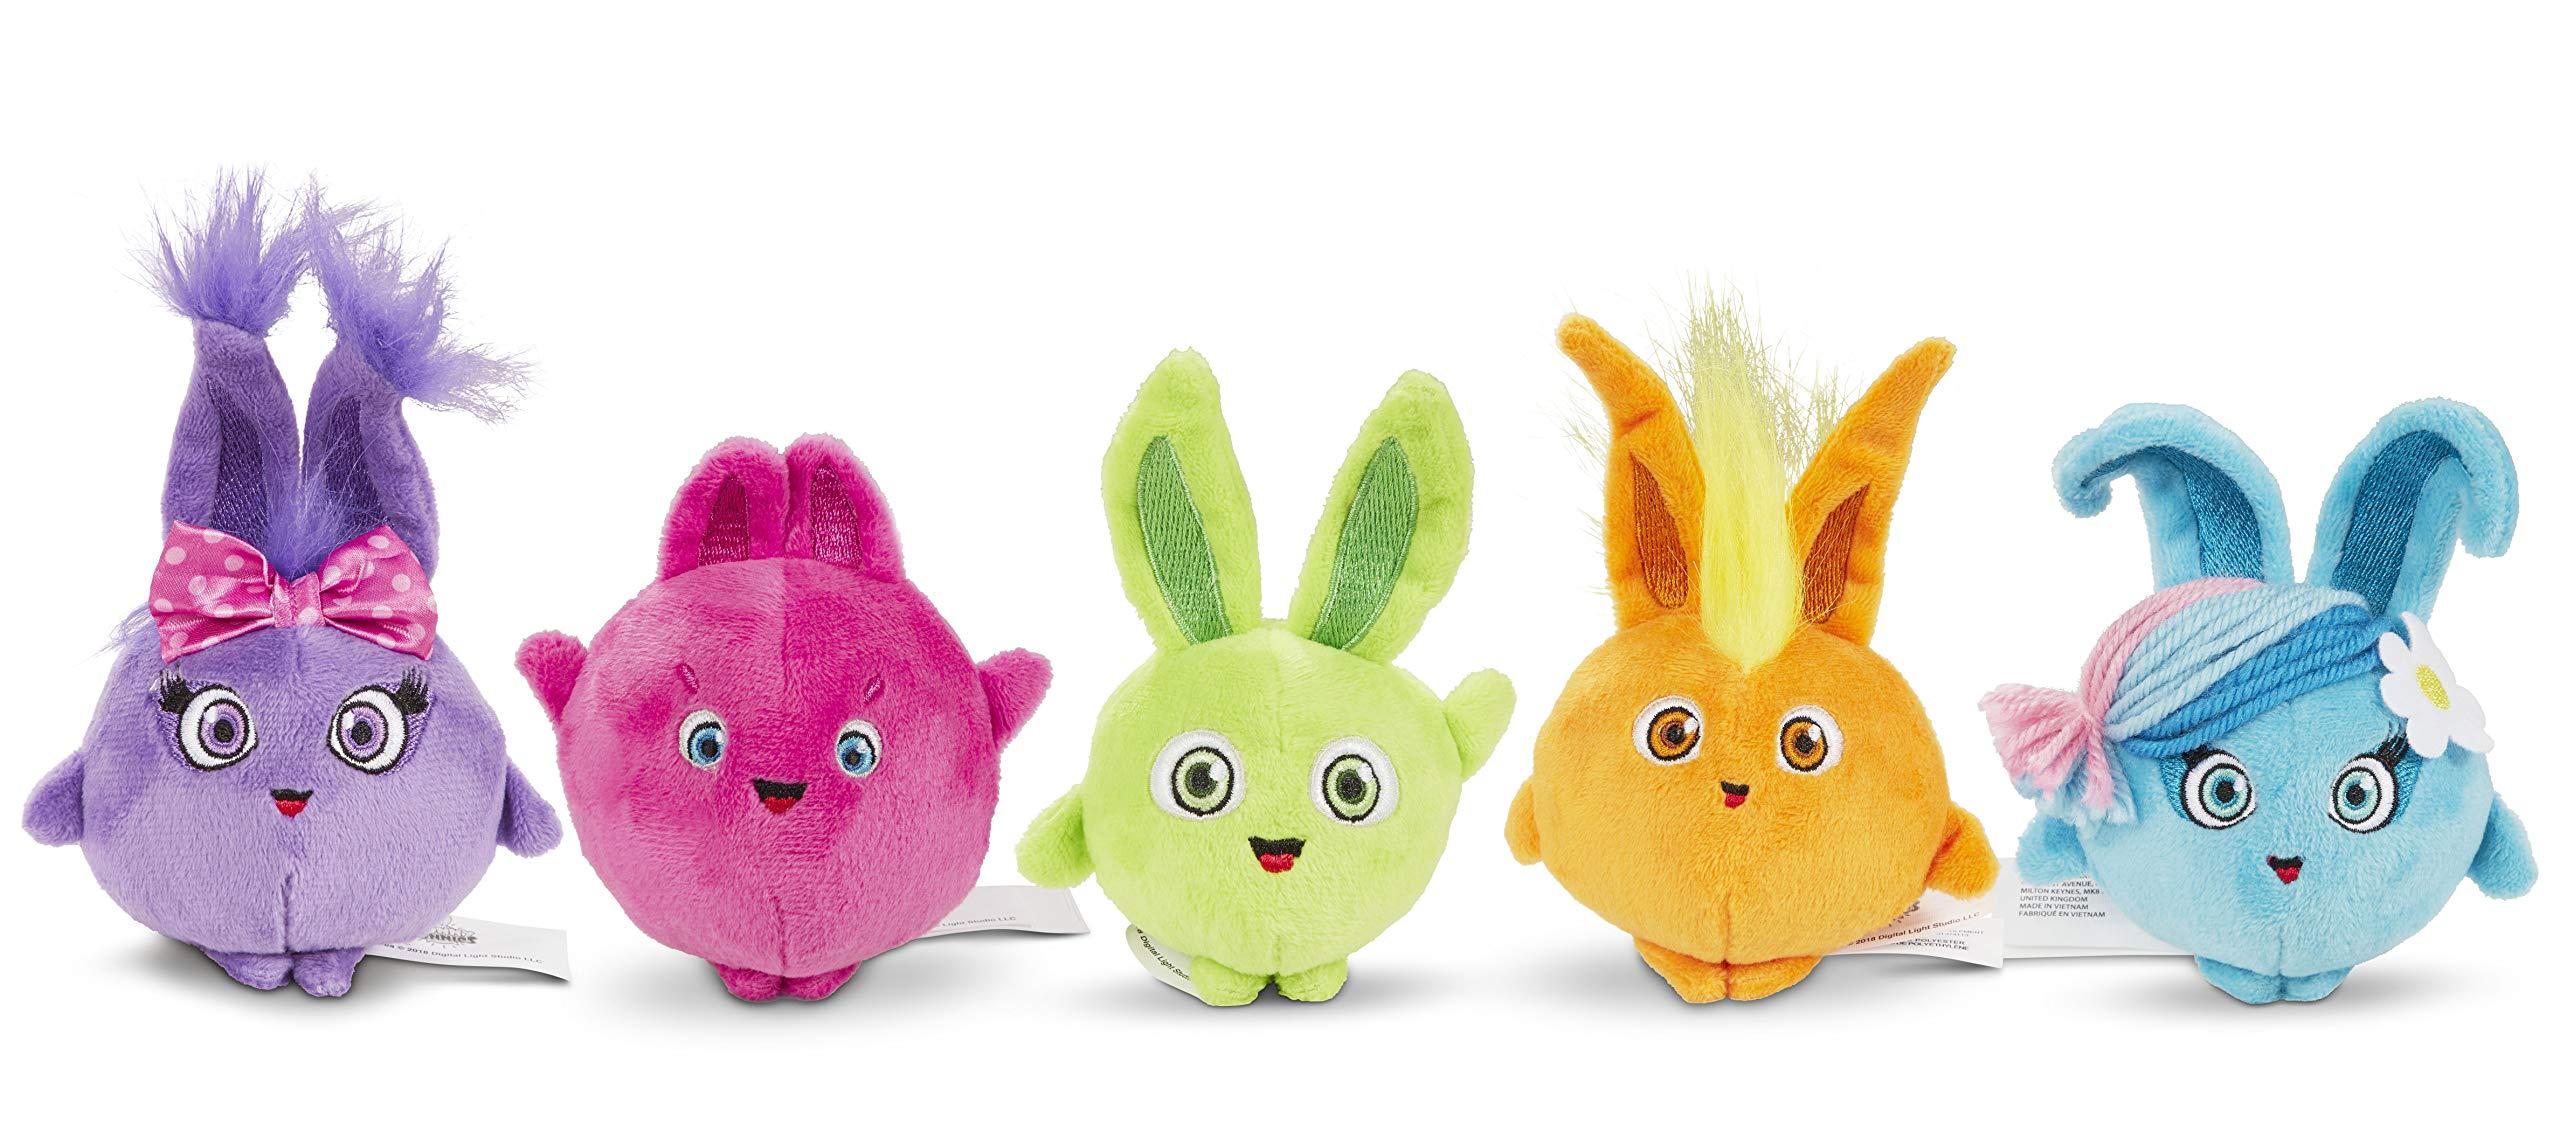 Hopper Sunny Bunnies Light Up And Bounce Plush